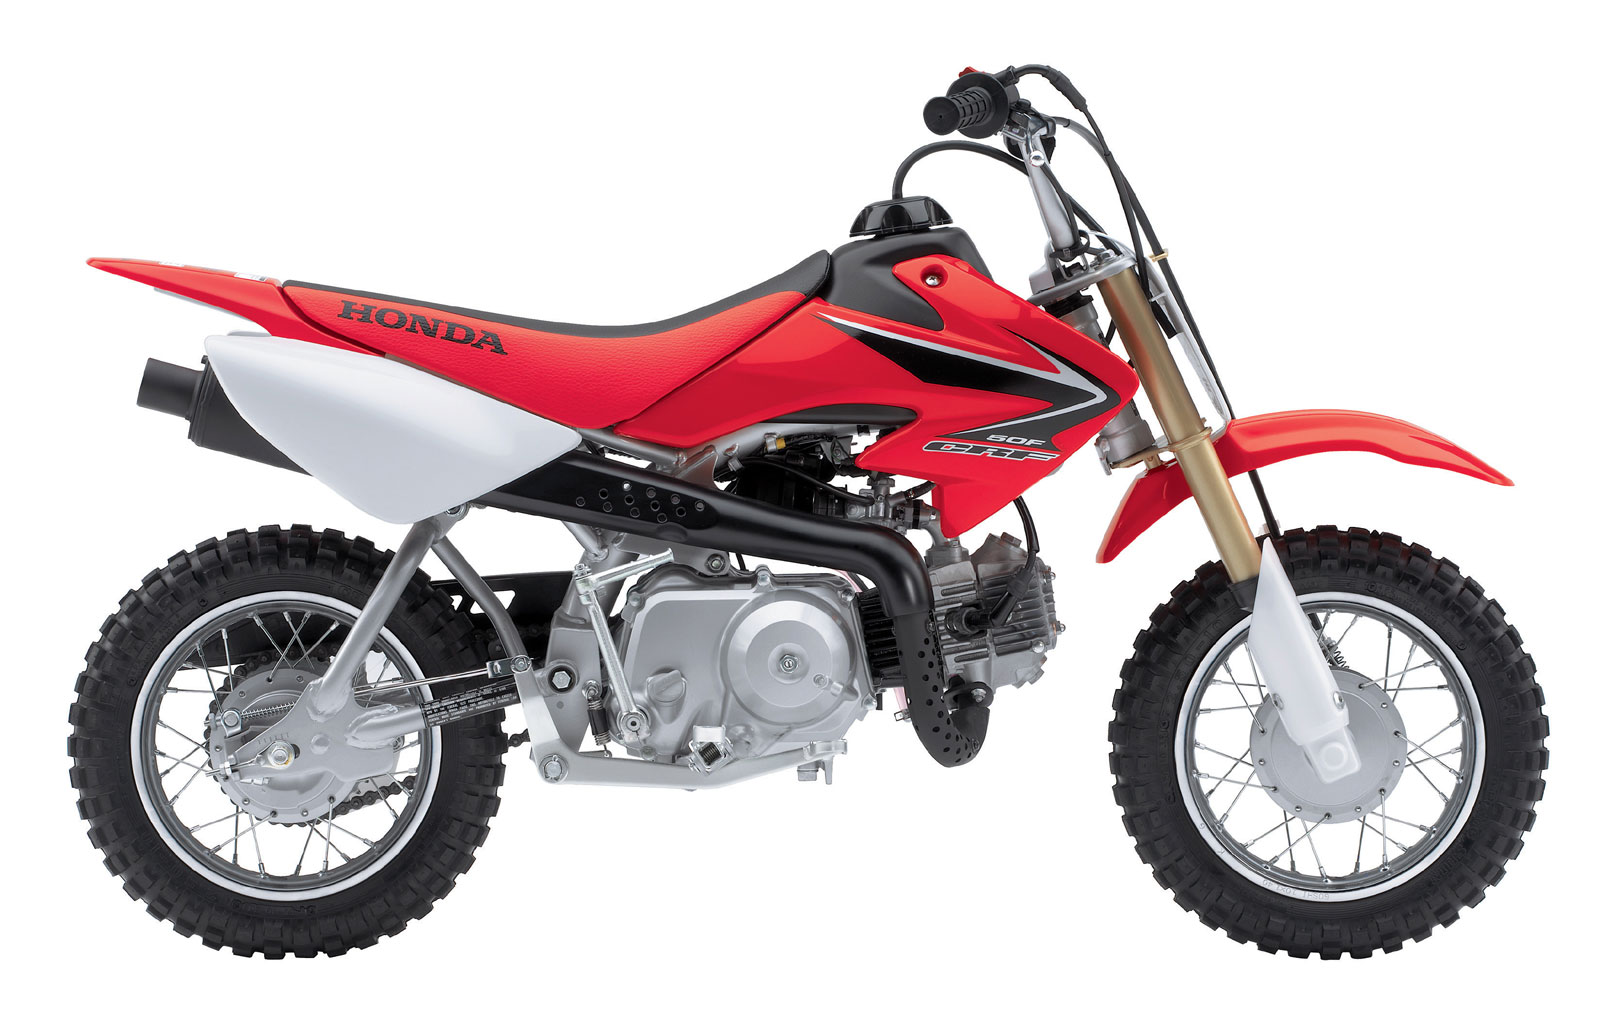 2008 honda motorcycle models new honda model